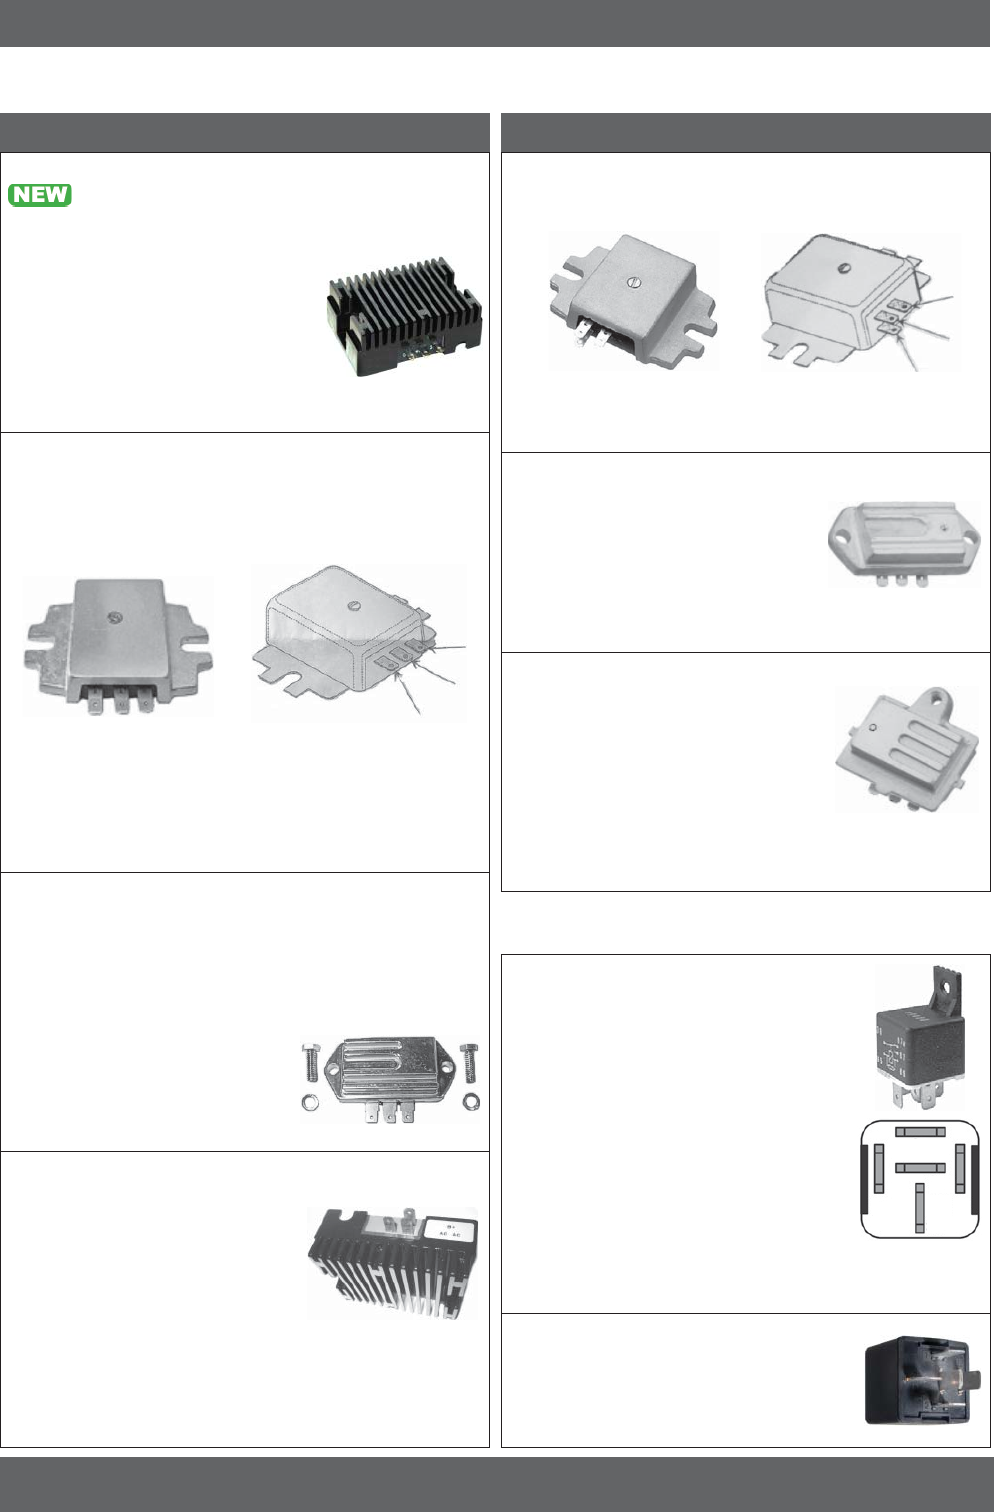 K482 Wiring Diagram Page 2 And Schematics Kohler K532 K361 Data Circuit Source Electrical Ignition Banta